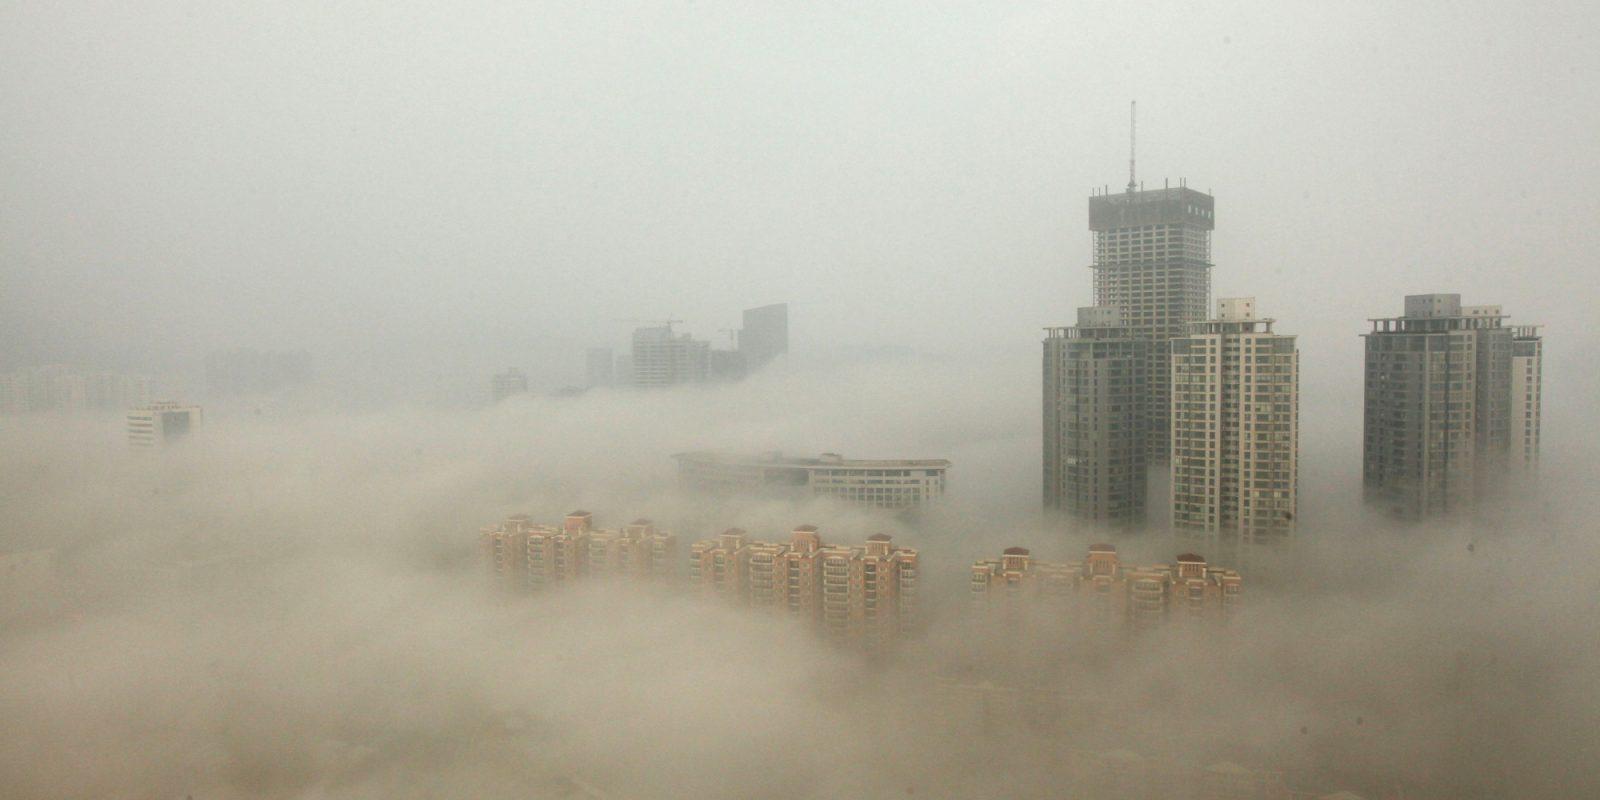 EGEB: China's air pollution hinders solar power, US net metering, greener travel, more